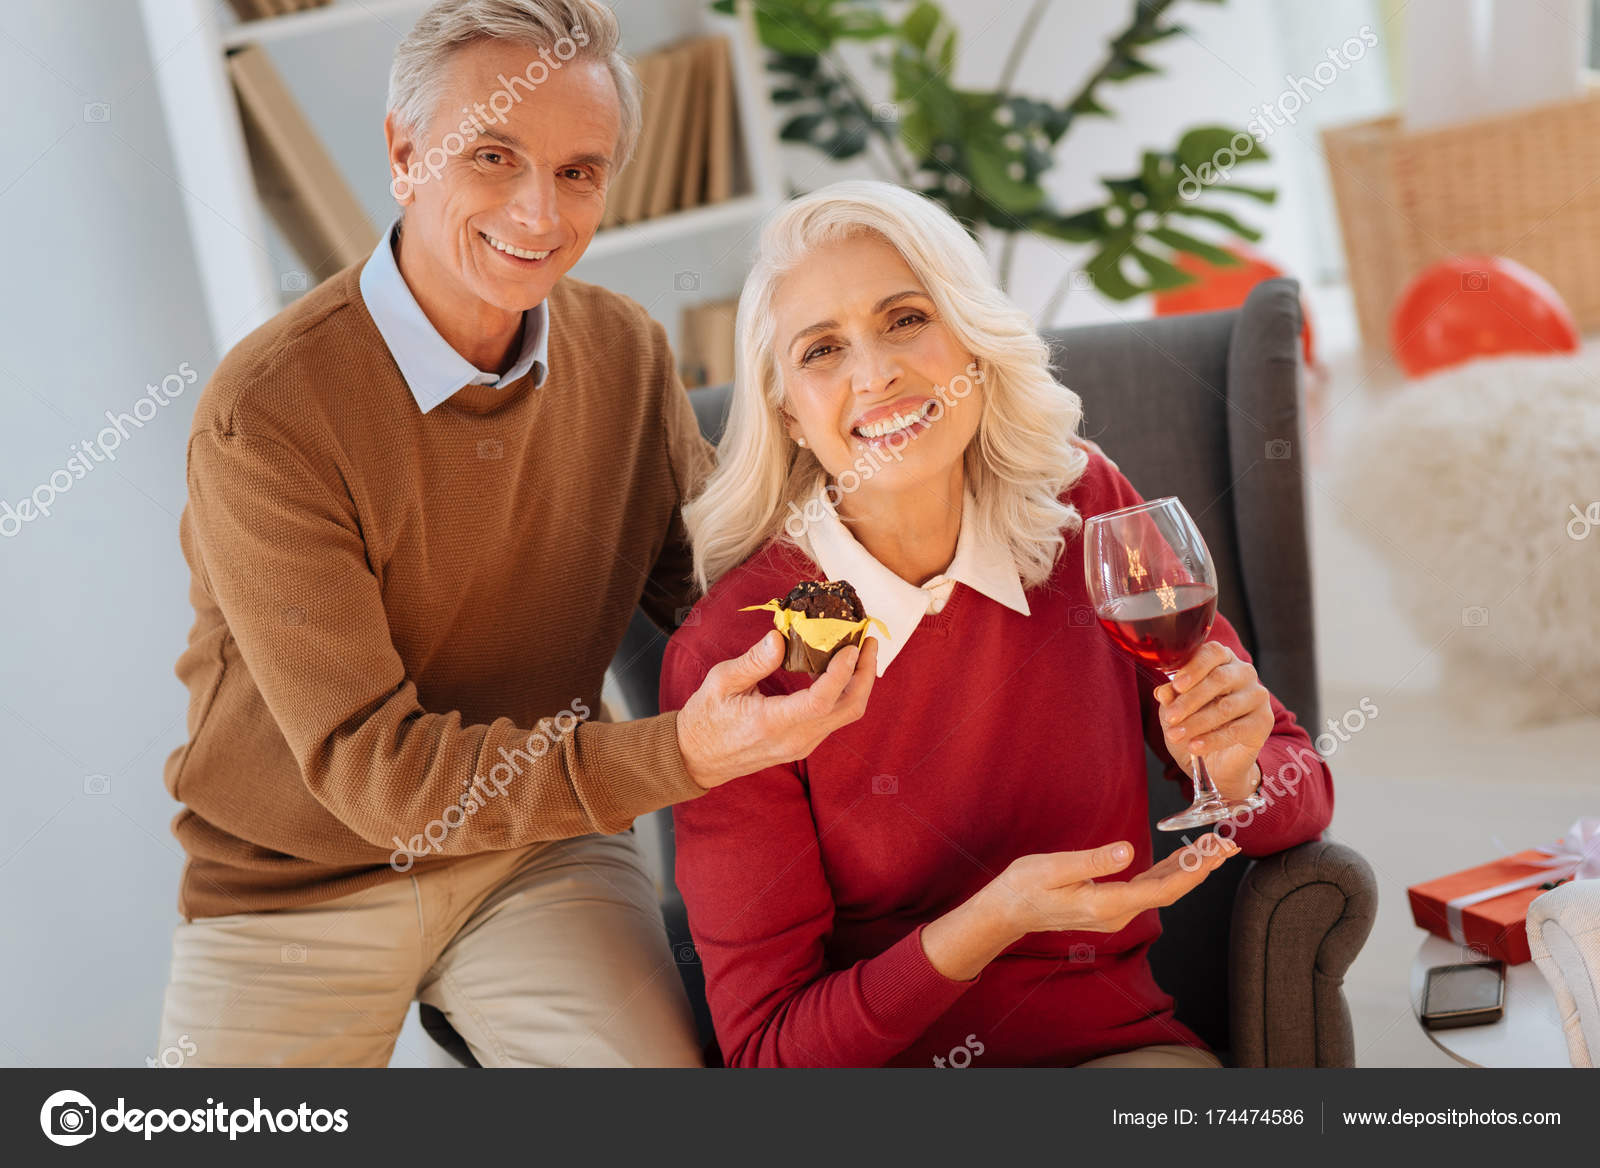 Evlilikte heyecan